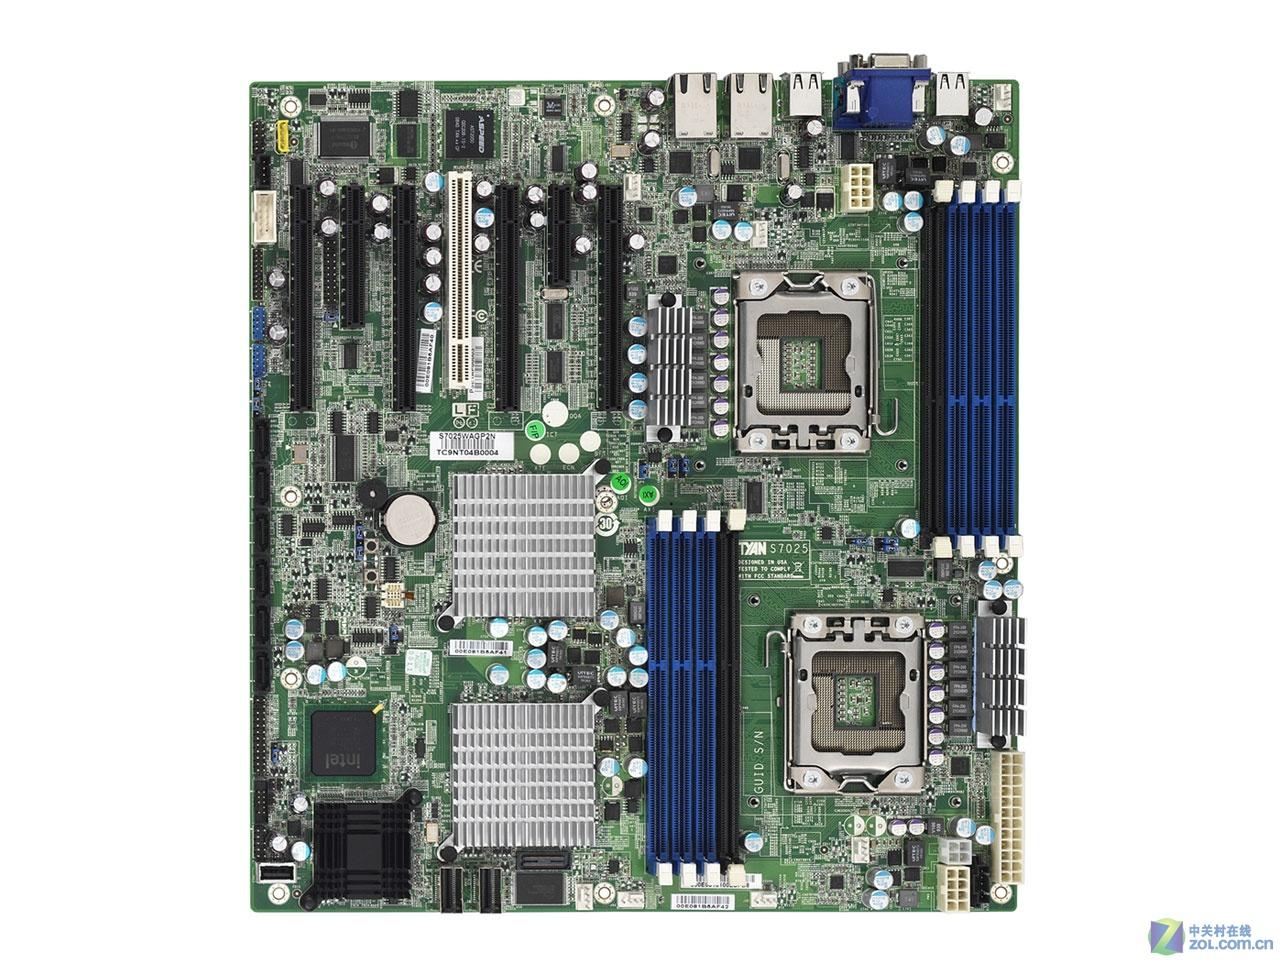 Intel 82815 Graphics Controller Driver Download Xp